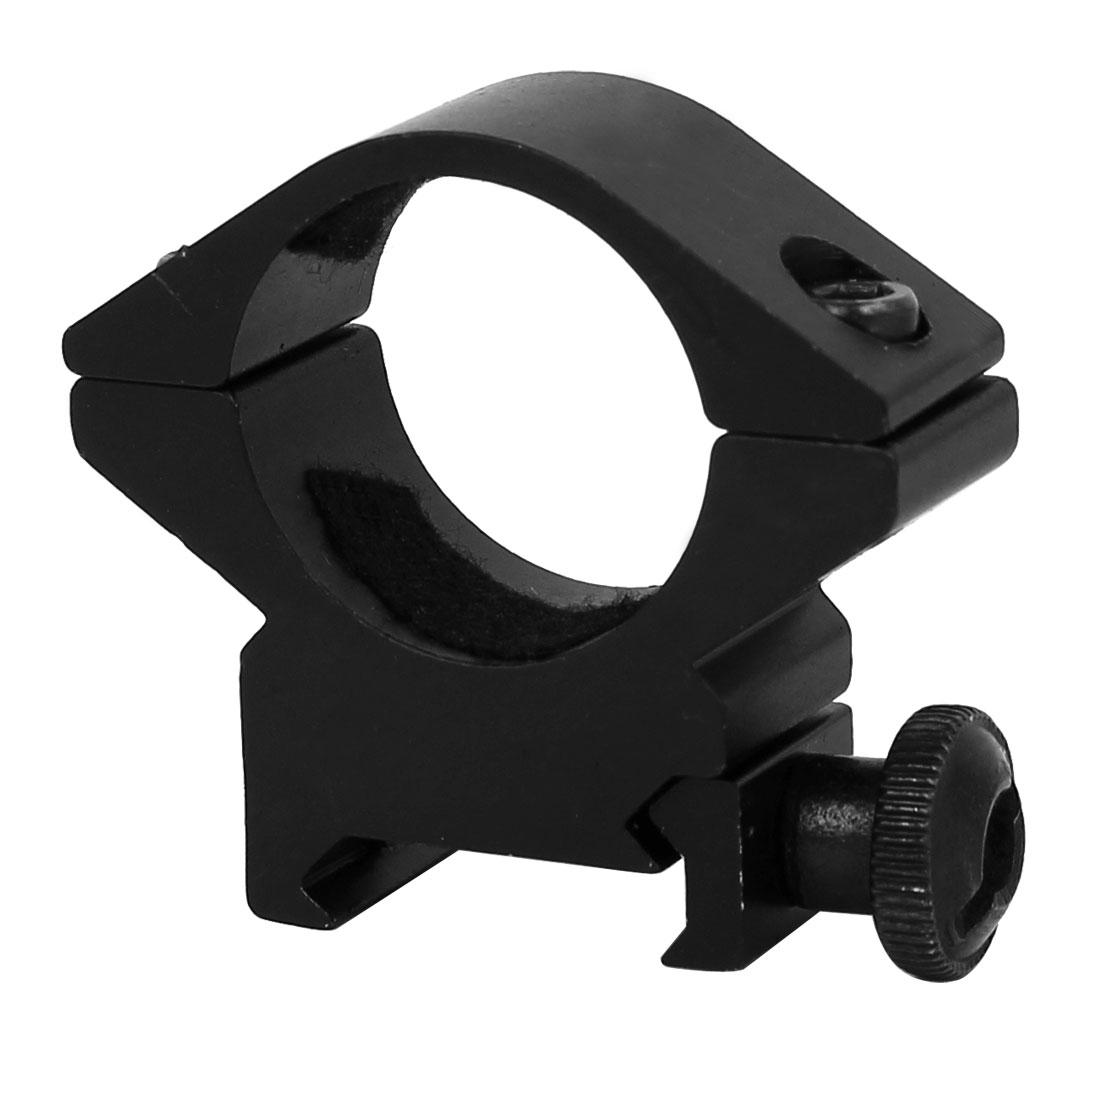 "Laser Flashlight Profile Quick Detach Barrel Adapter Clamp Clip for 1"" Rail"